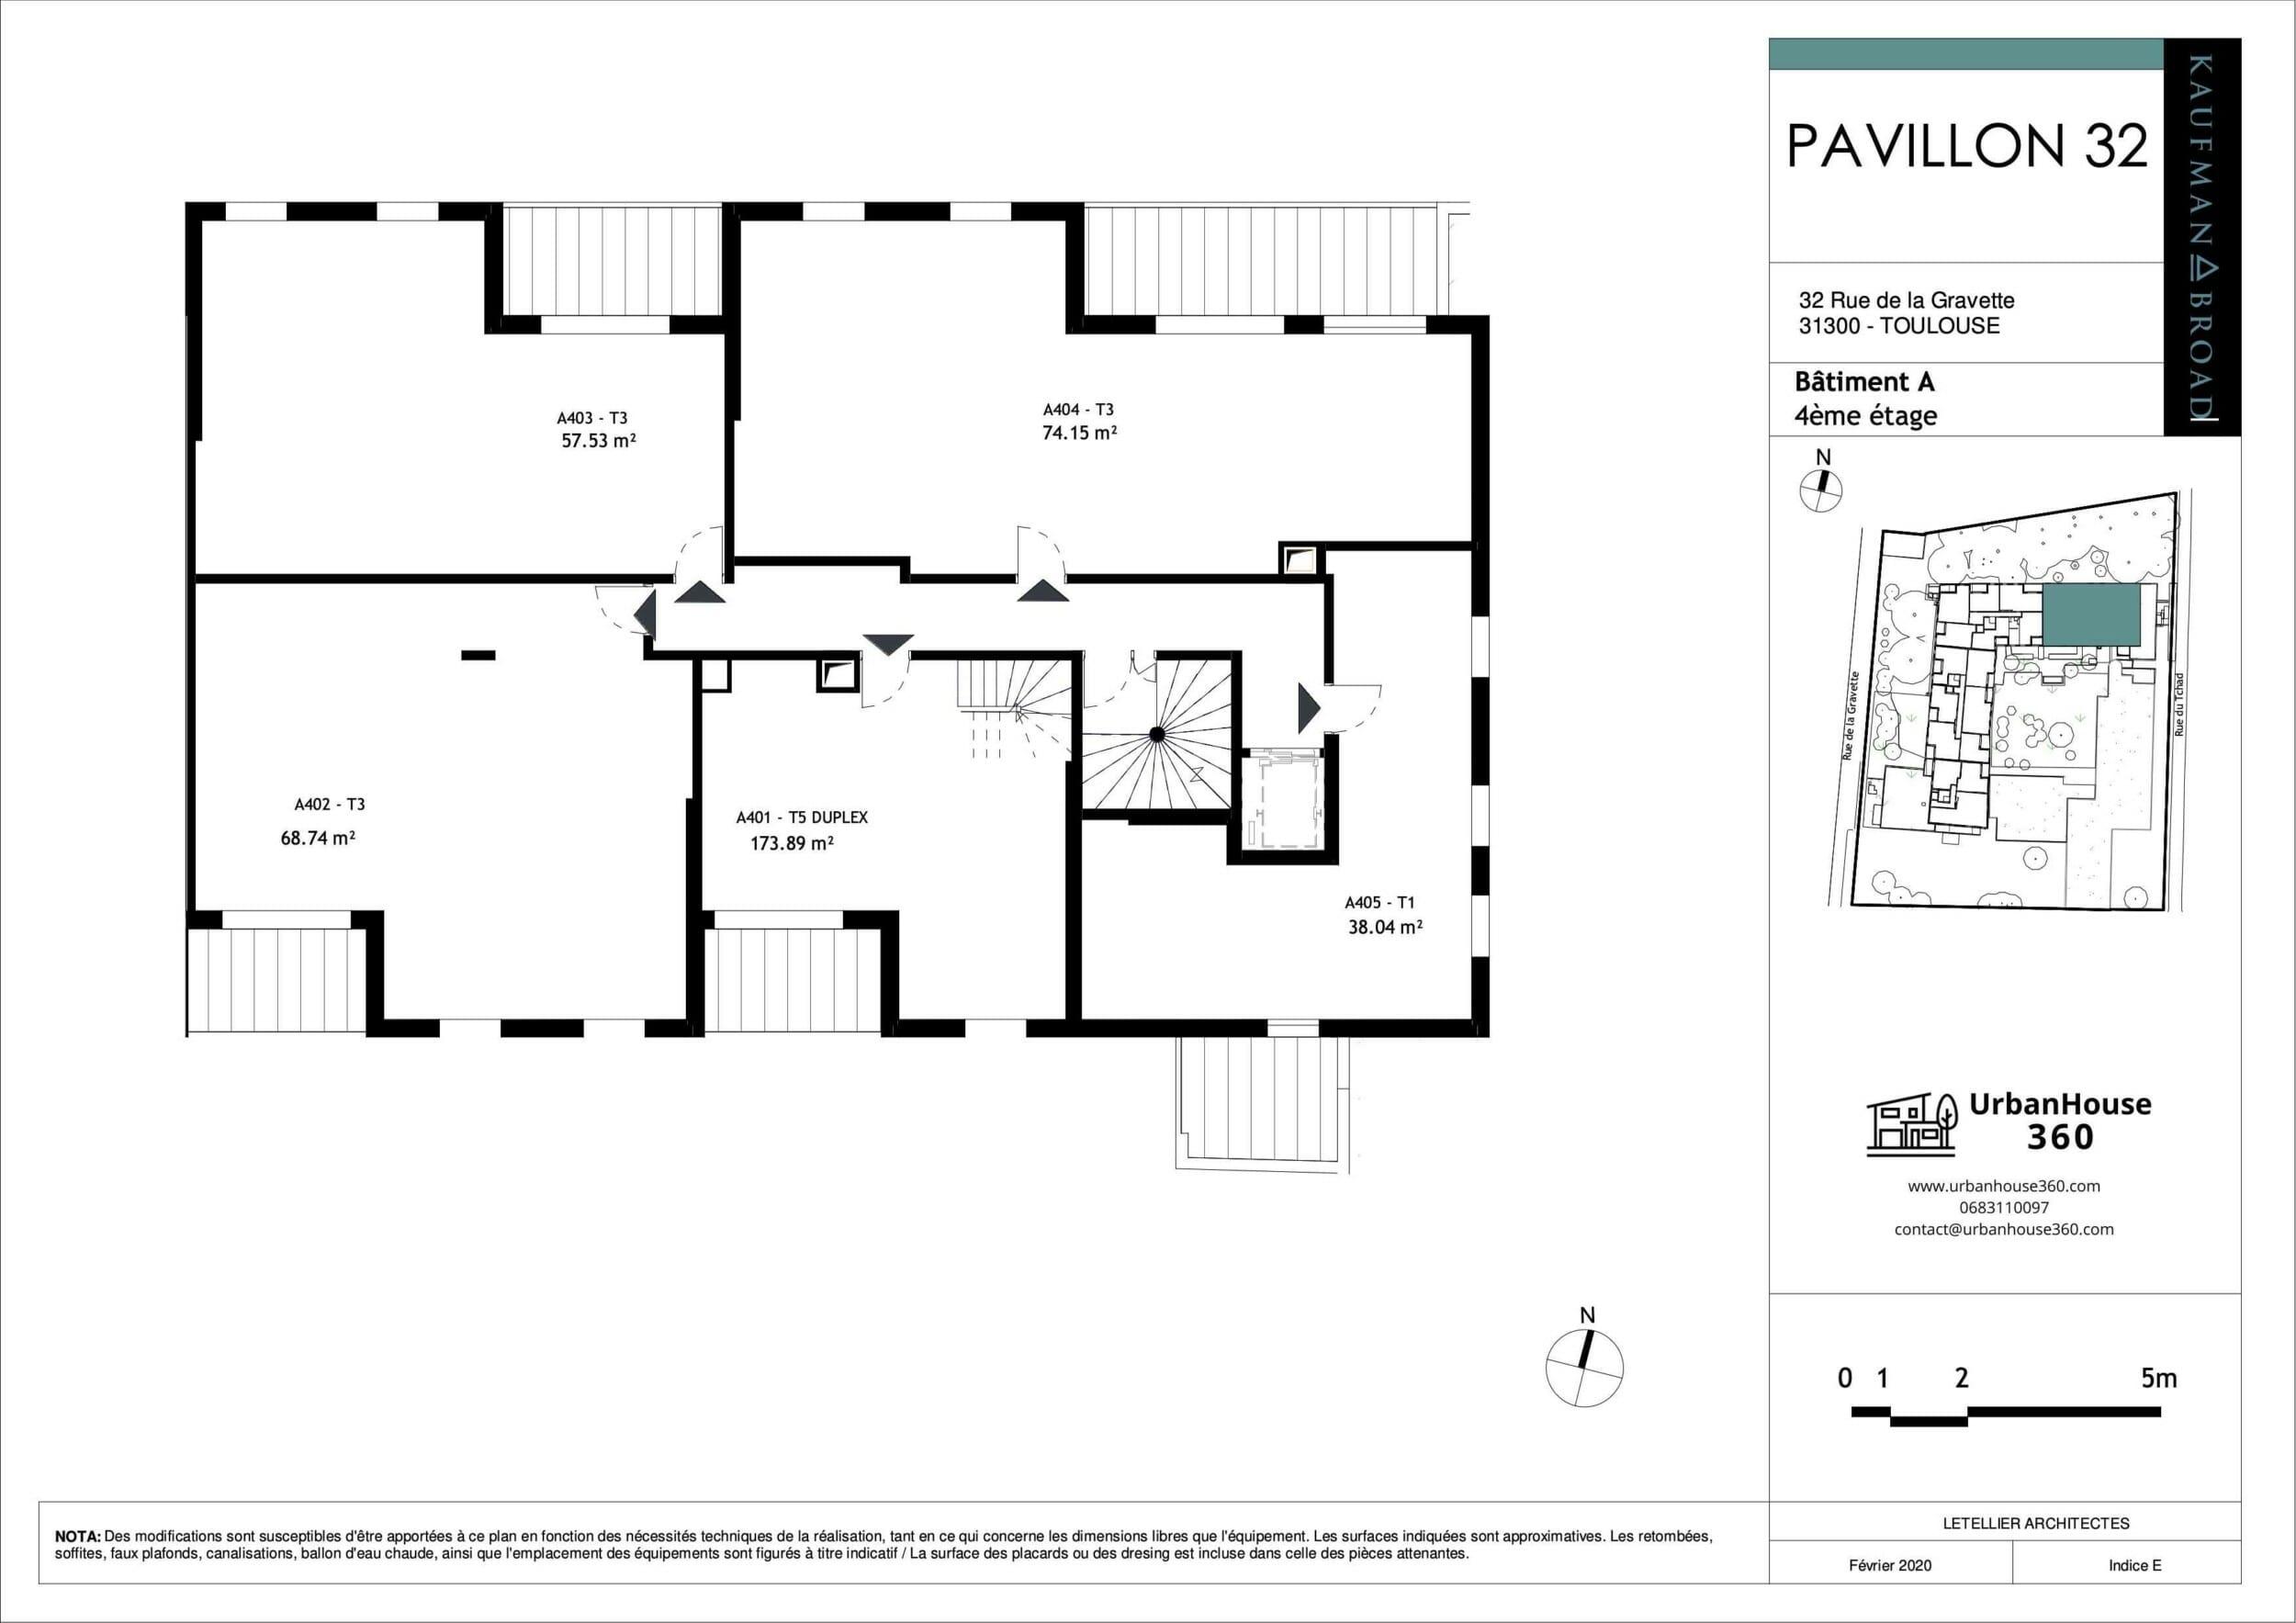 UrbanHouse360-Pavillon32-A_R+4_ind E